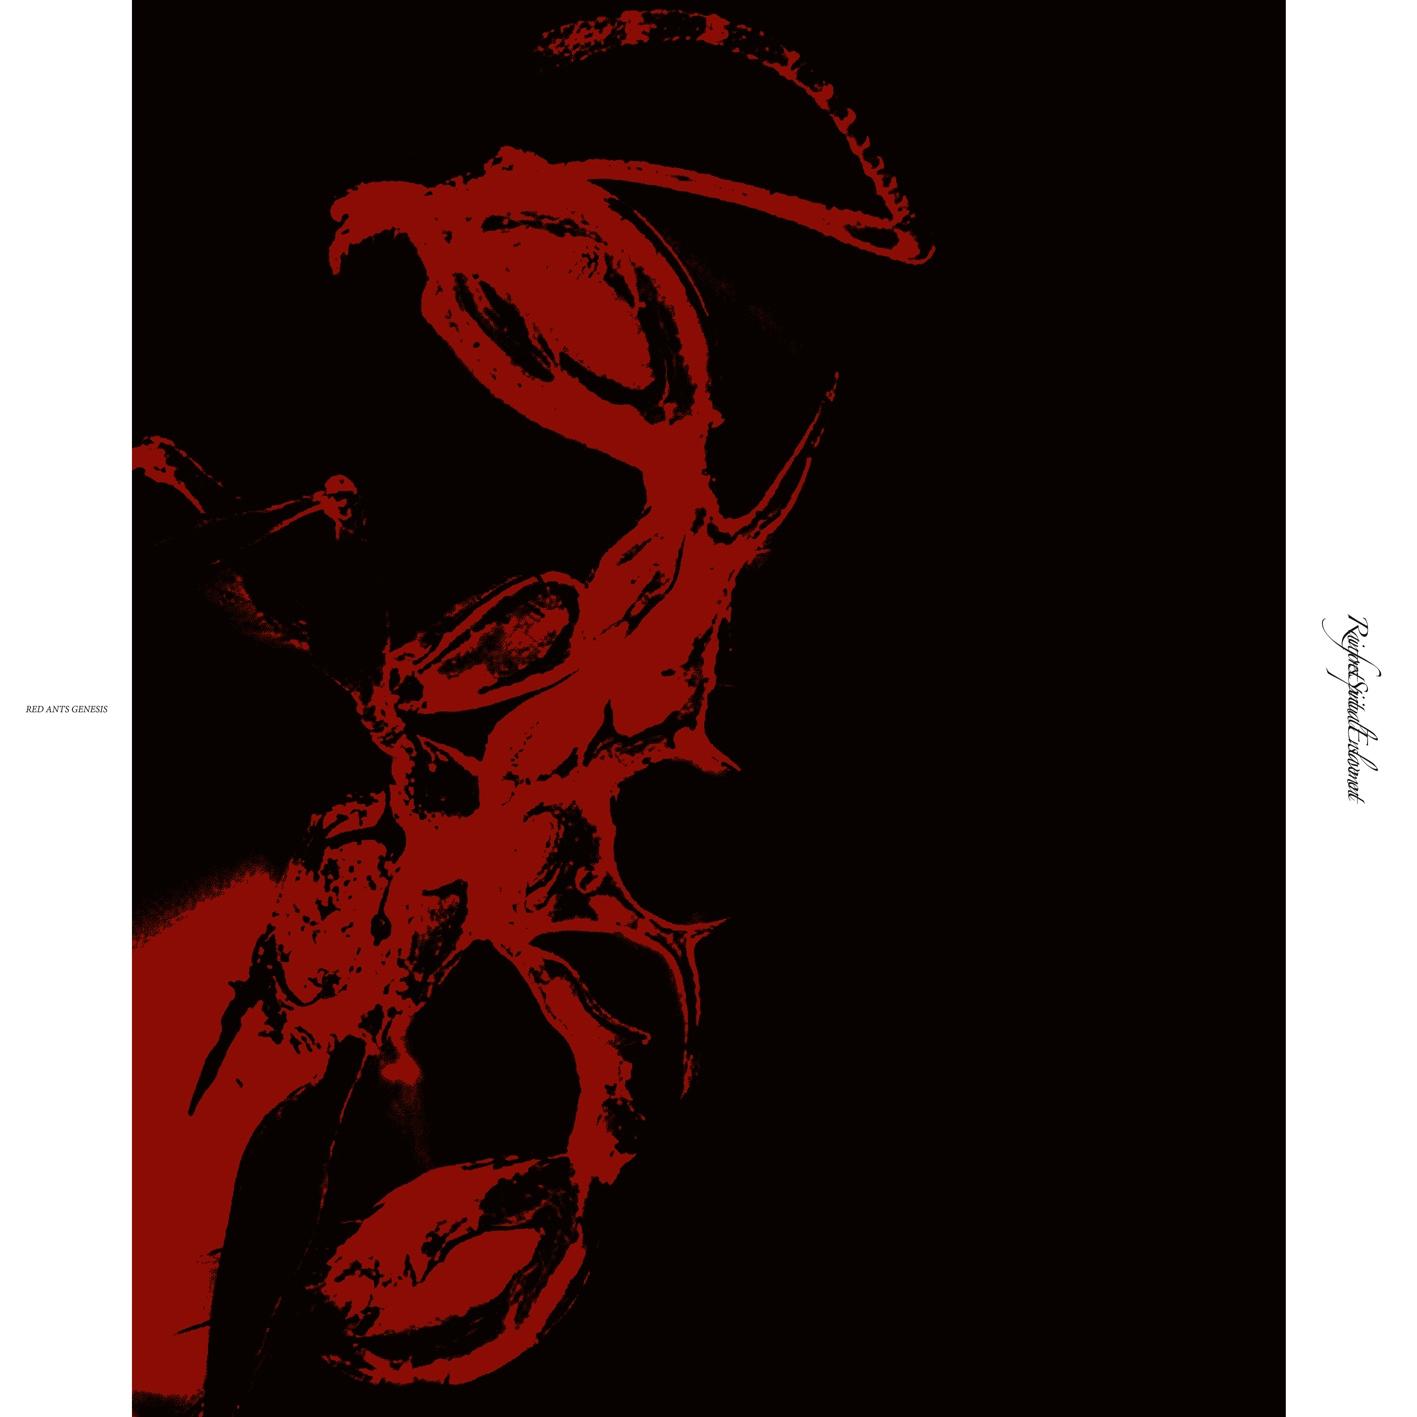 Rainforest Spiritual Enslavement drop Red Ants Genesis